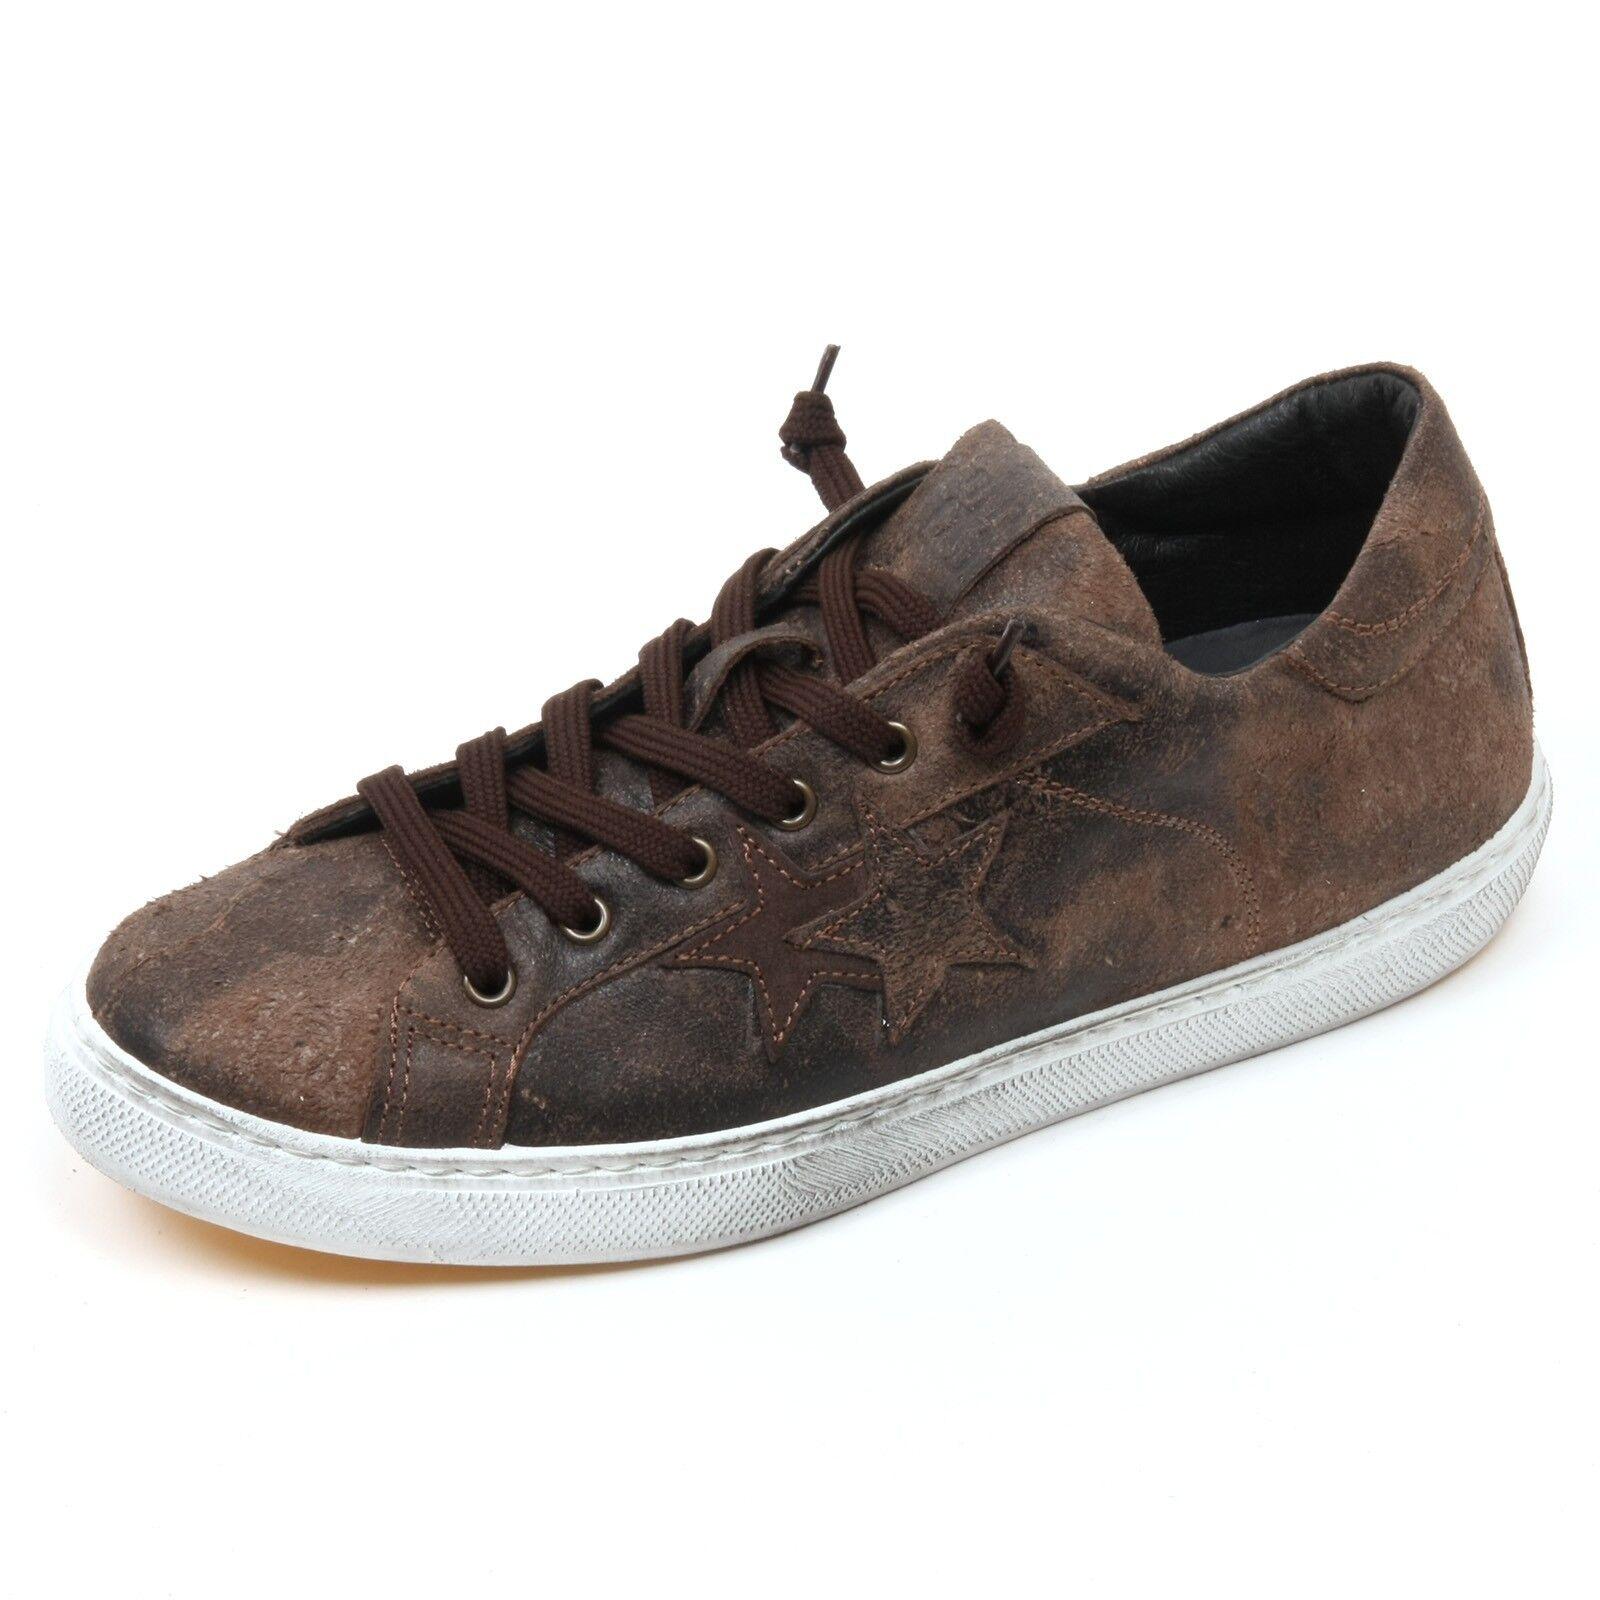 C4030 sneaker uomo 2STAR scarpa marrone scuro shoe man